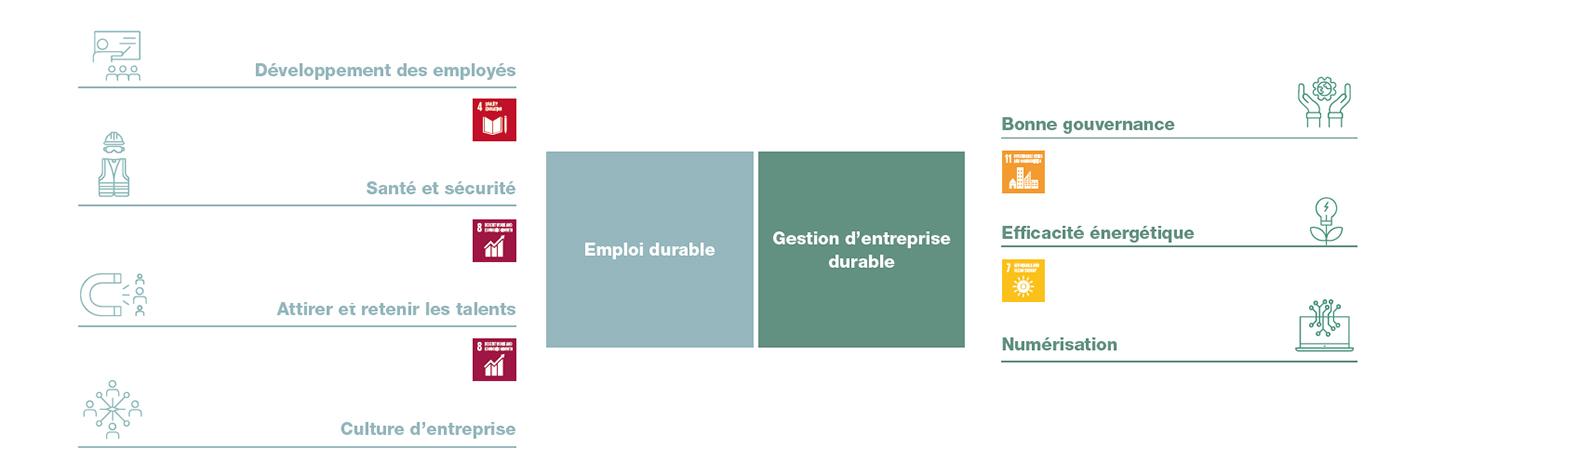 WDP ESG - FR